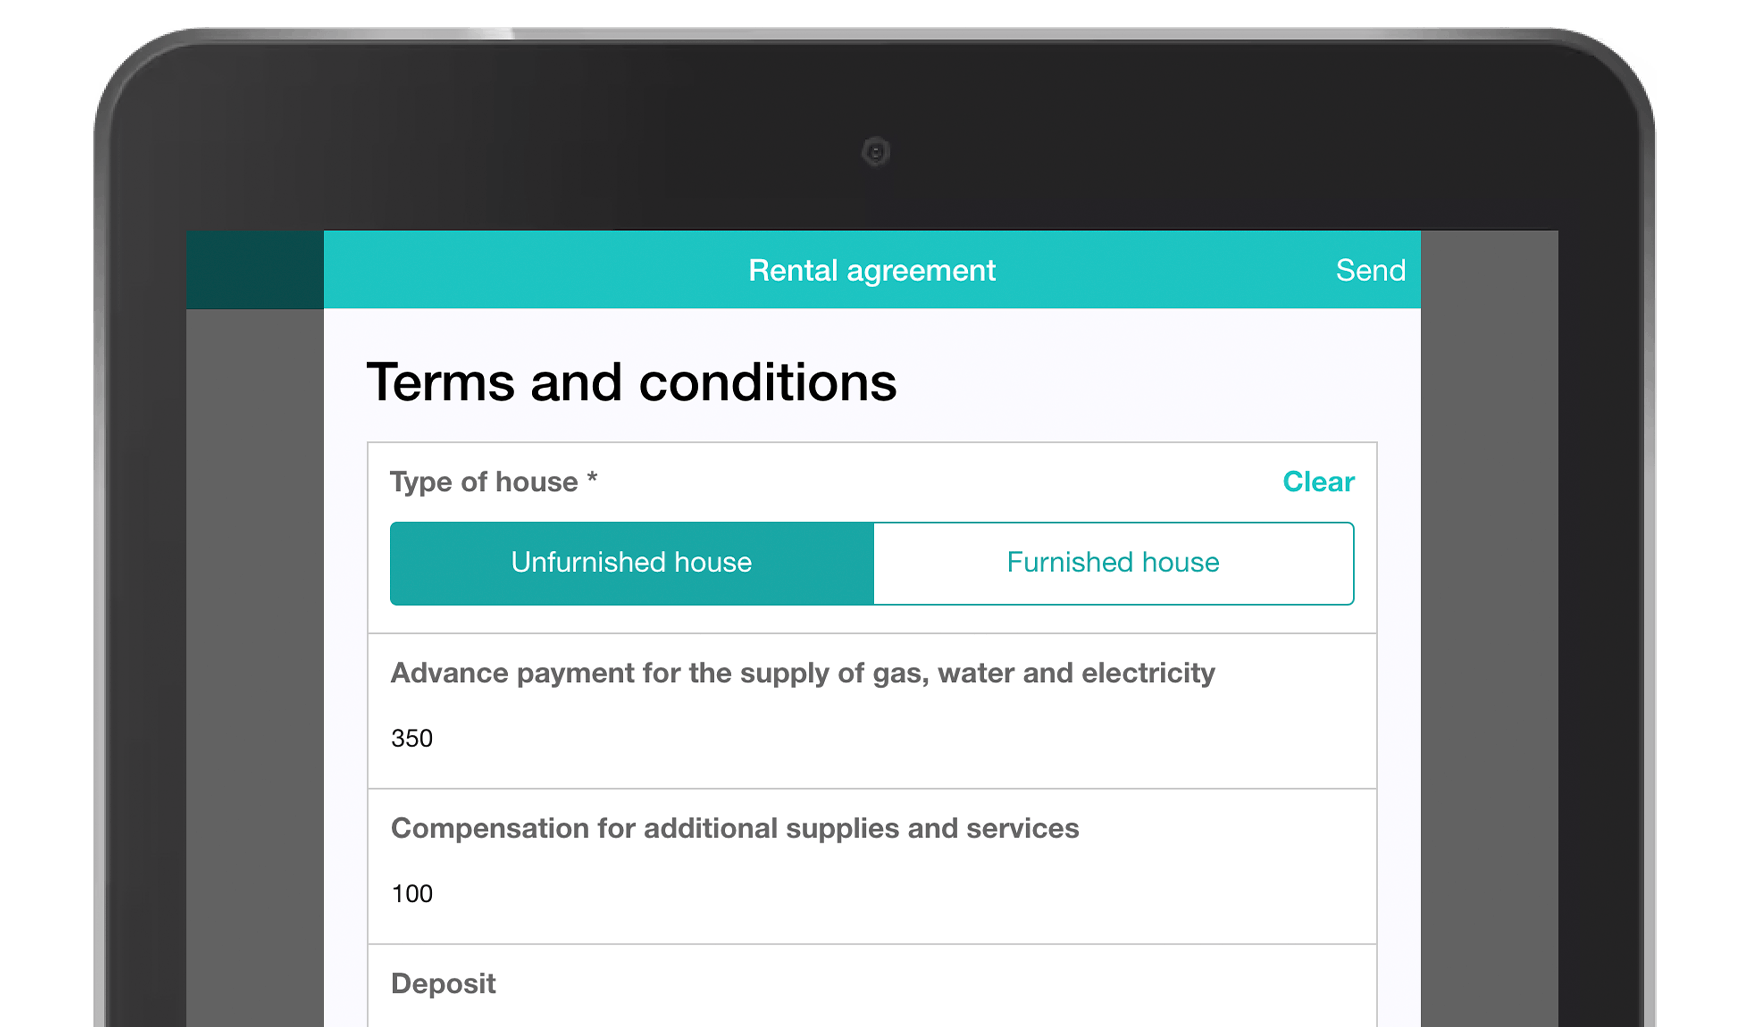 MoreApp Rental agreement form